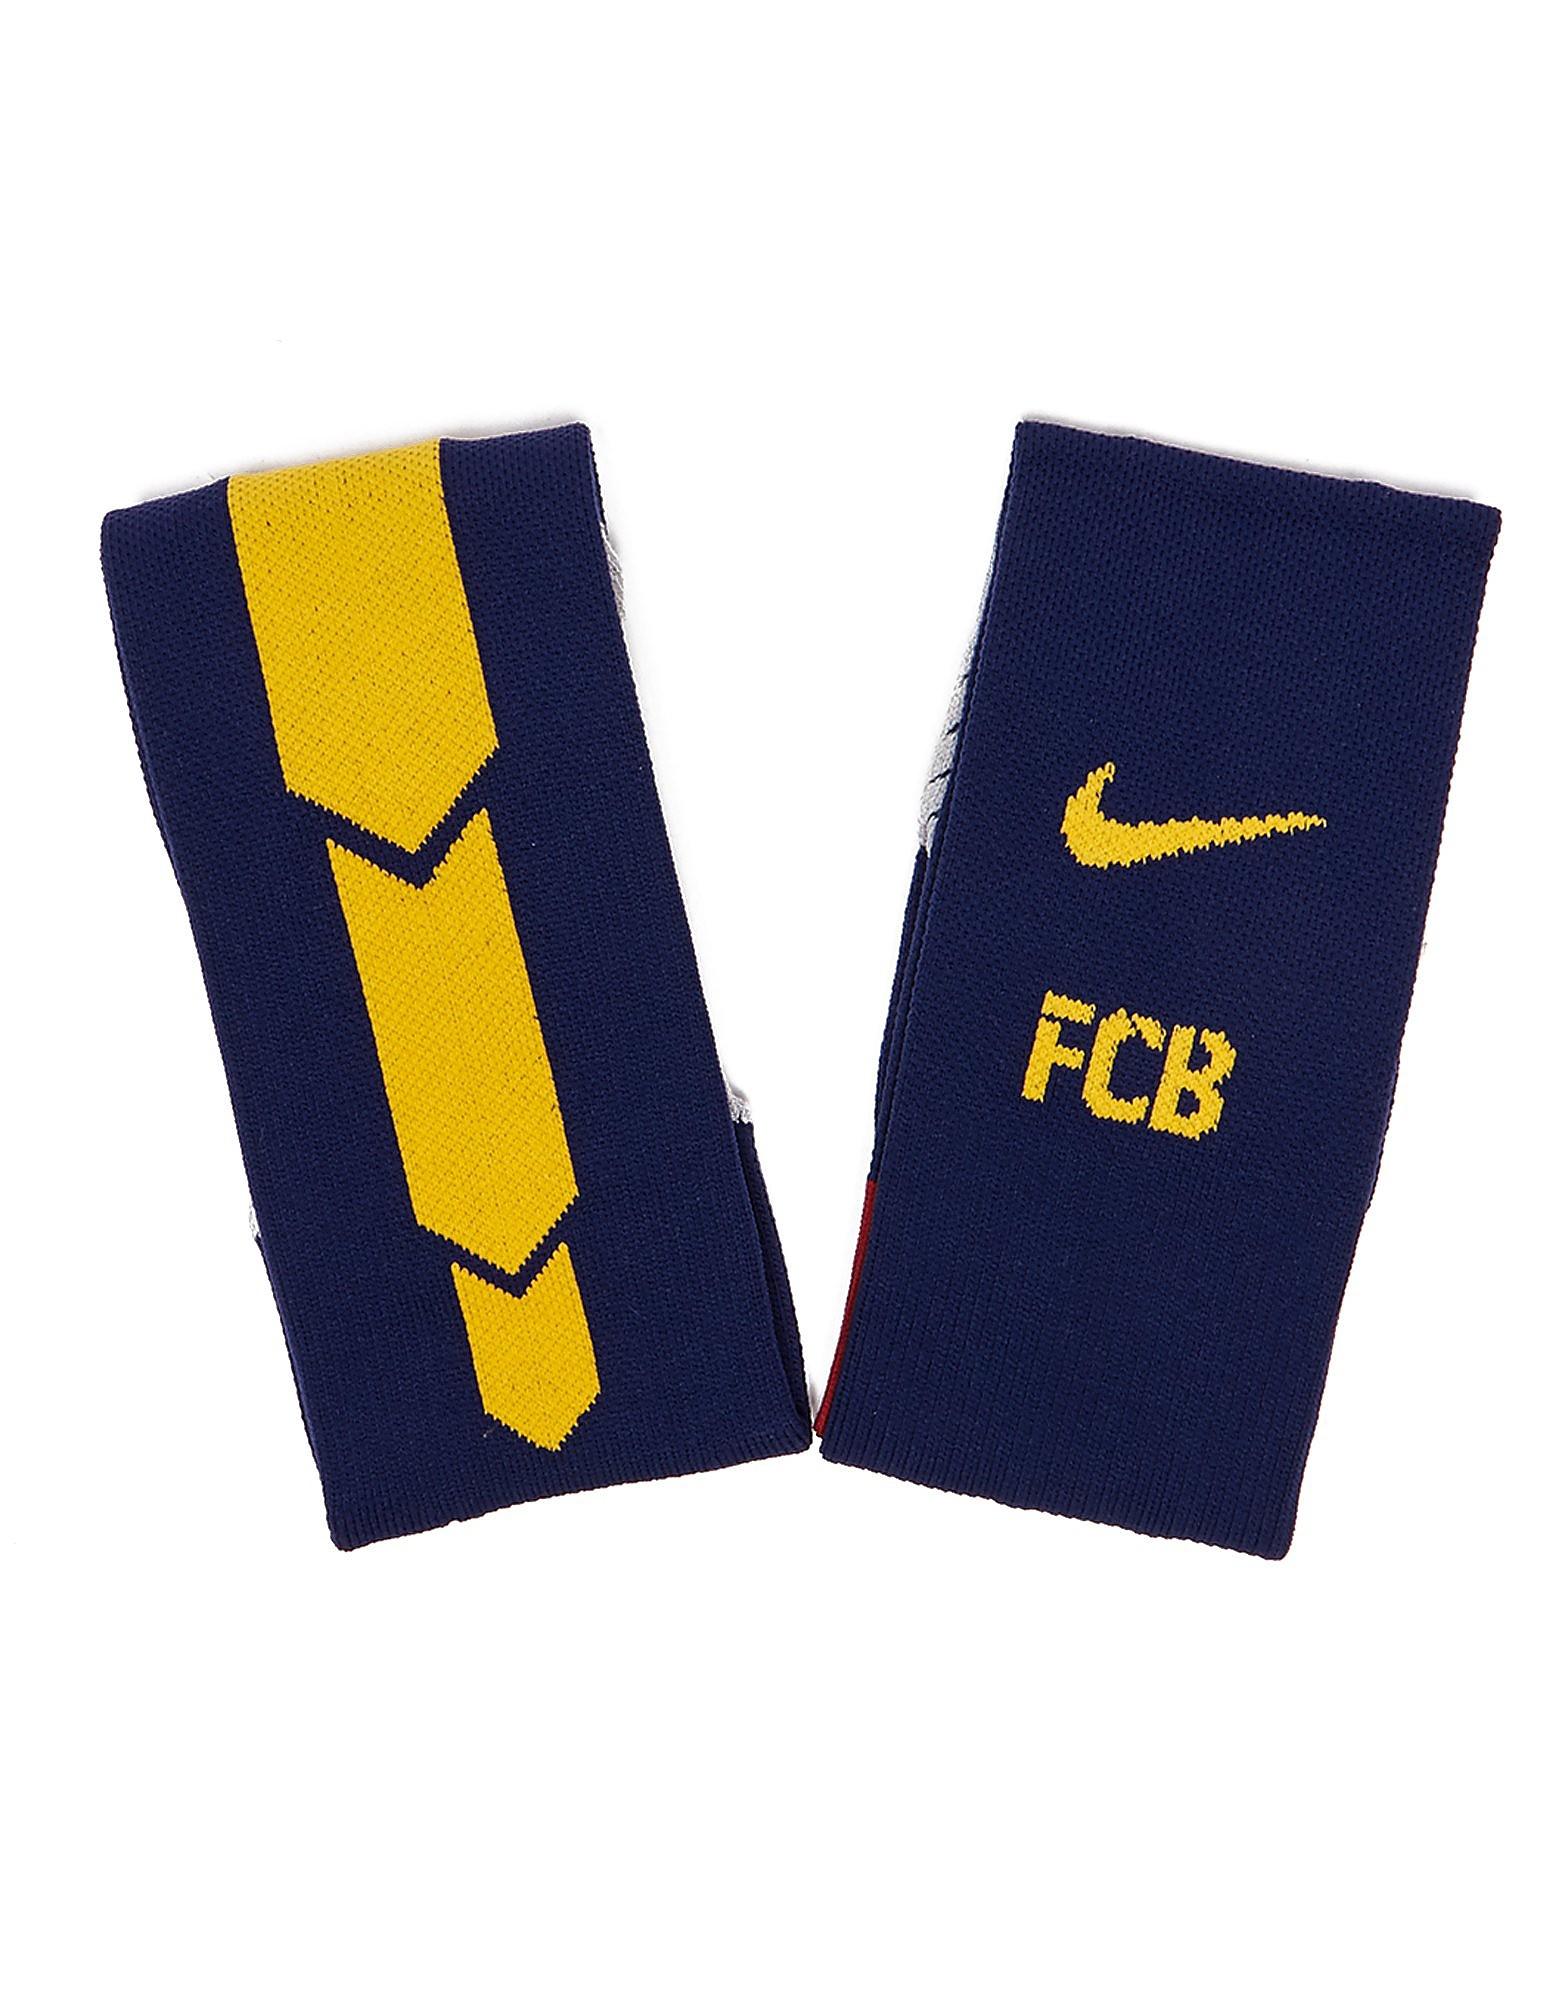 Nike FC Barcelona 2015/16 Home Socks